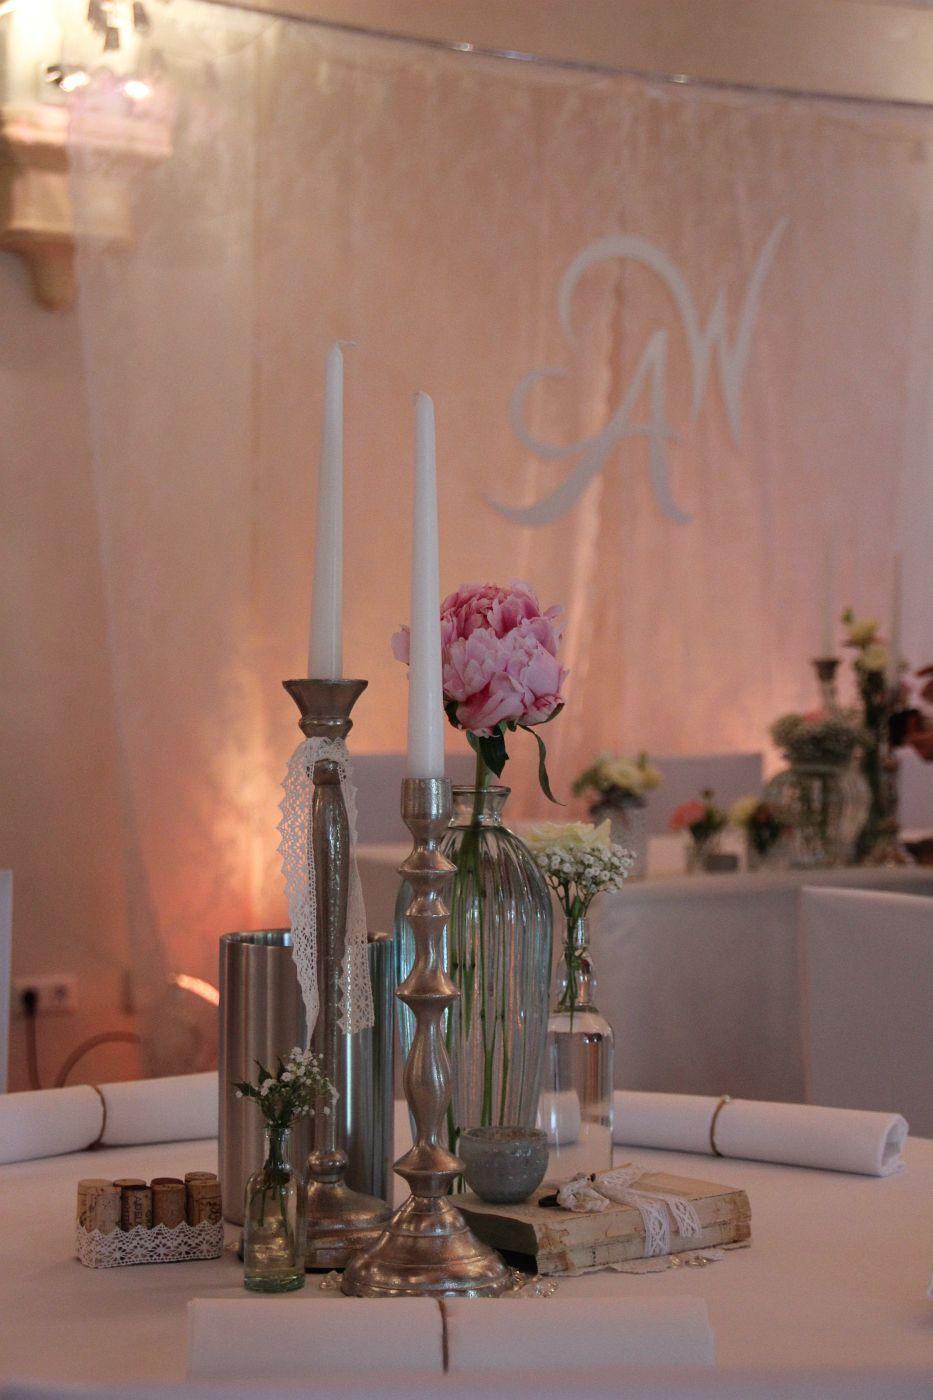 ♥♥♥ Vintage Hochzeit & Kerzenständer http://www.weddstyle.de/kerzenstaender-mieten.html #weddstyle